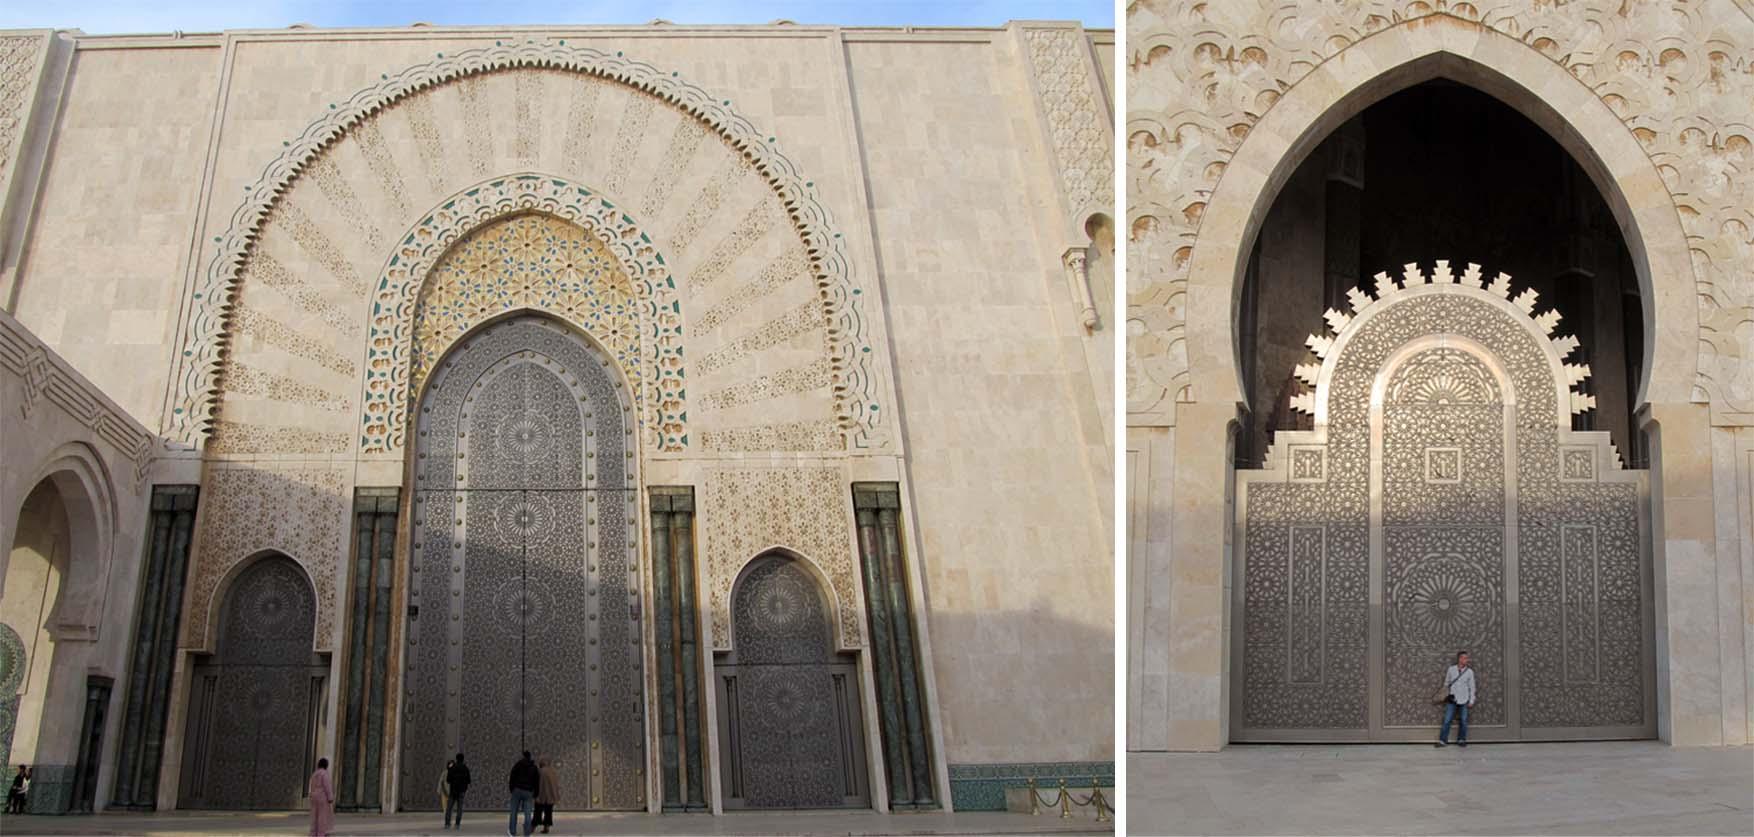 97 maroko kazablanka velika dzamija